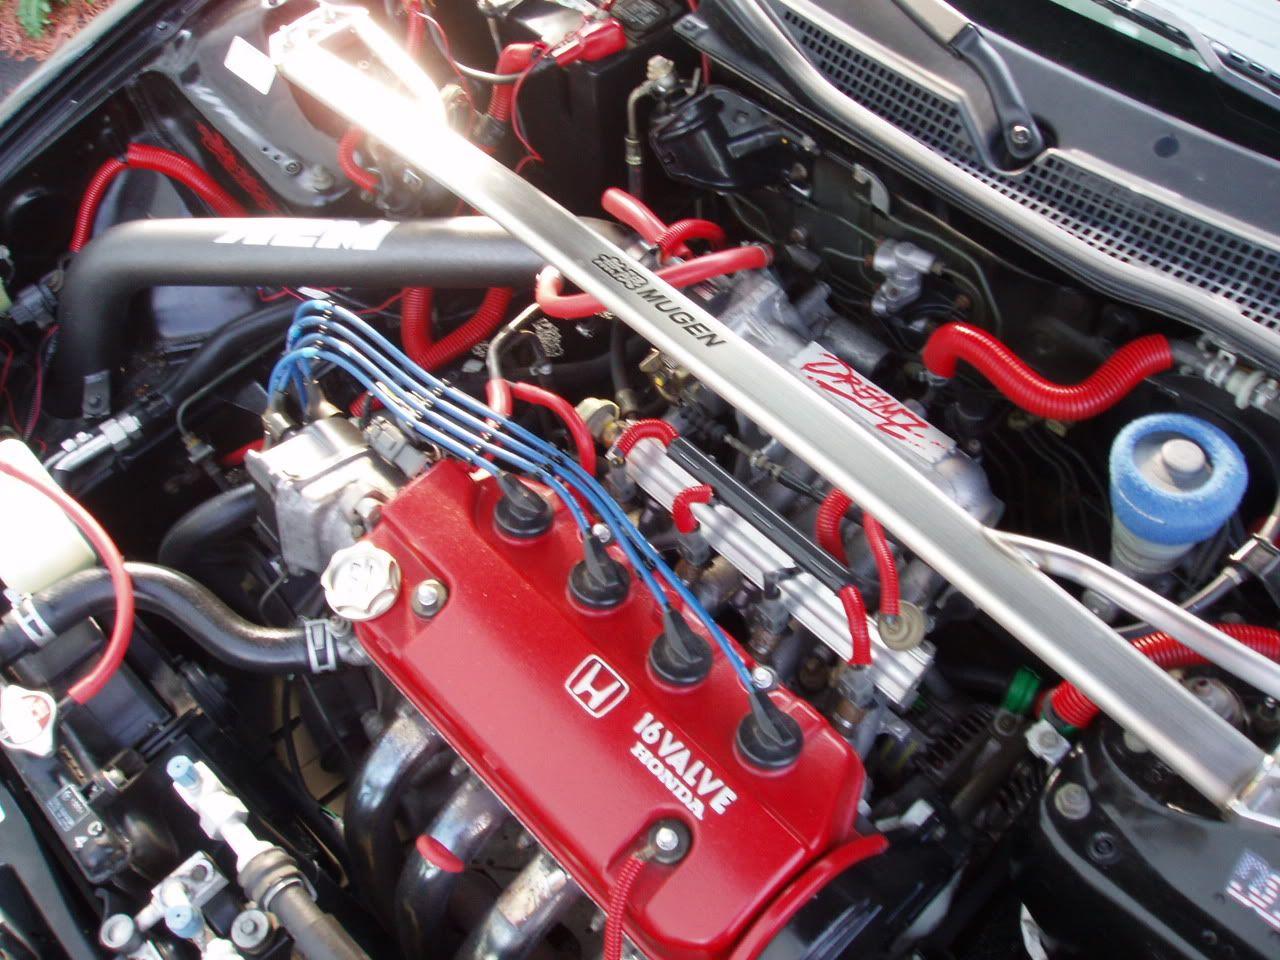 Civic Del Sol S Engine 1 6l 16valve 1 6litre 16valve Civic Delsol Japanese Honda Civic Truck Accesories Honda Car